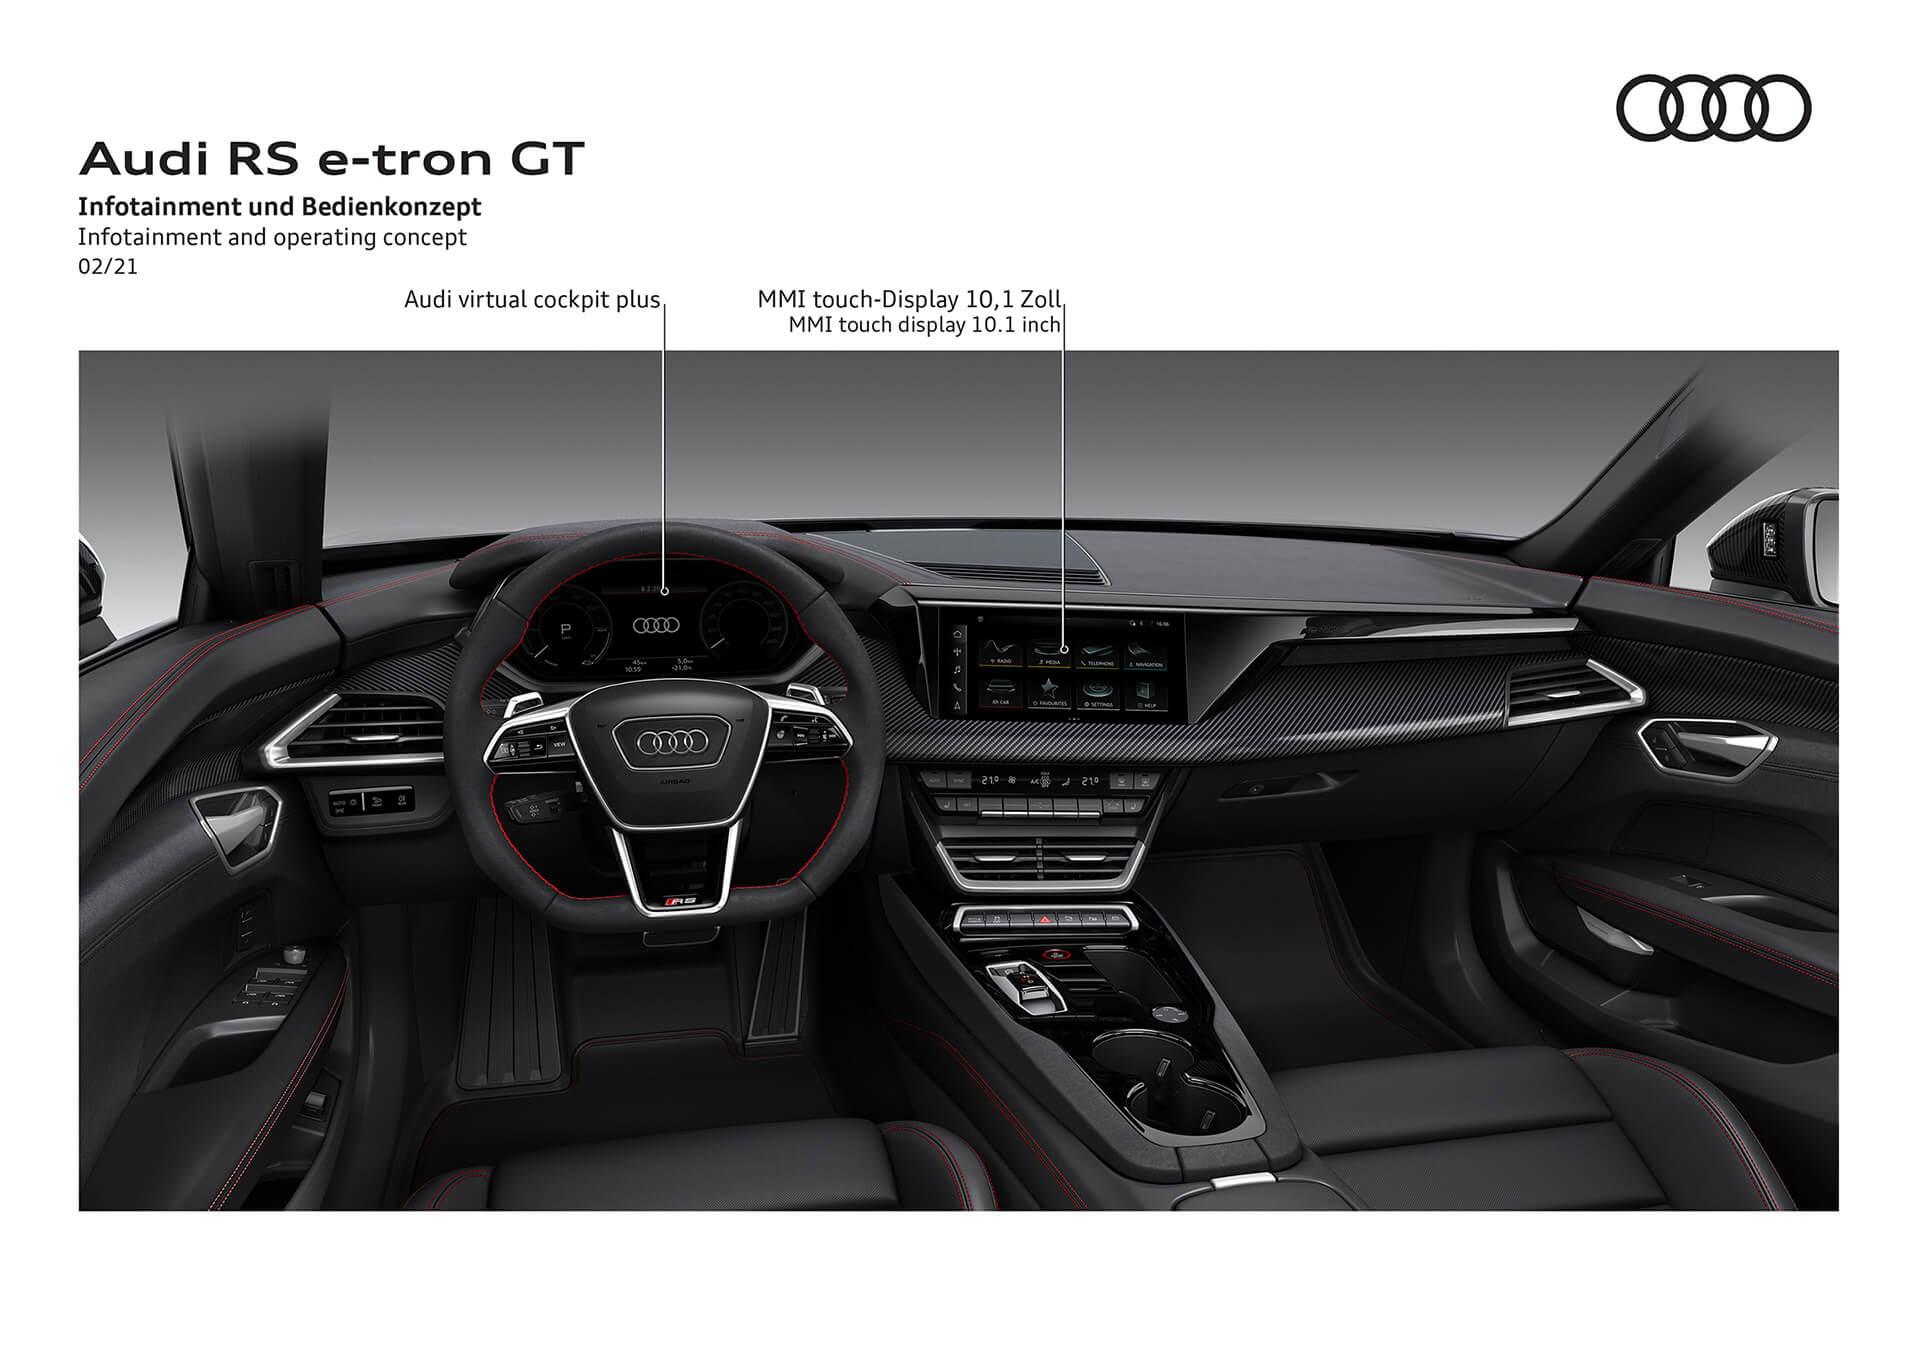 Audi RS e-tron GT - Χειρισμός και οθόνες